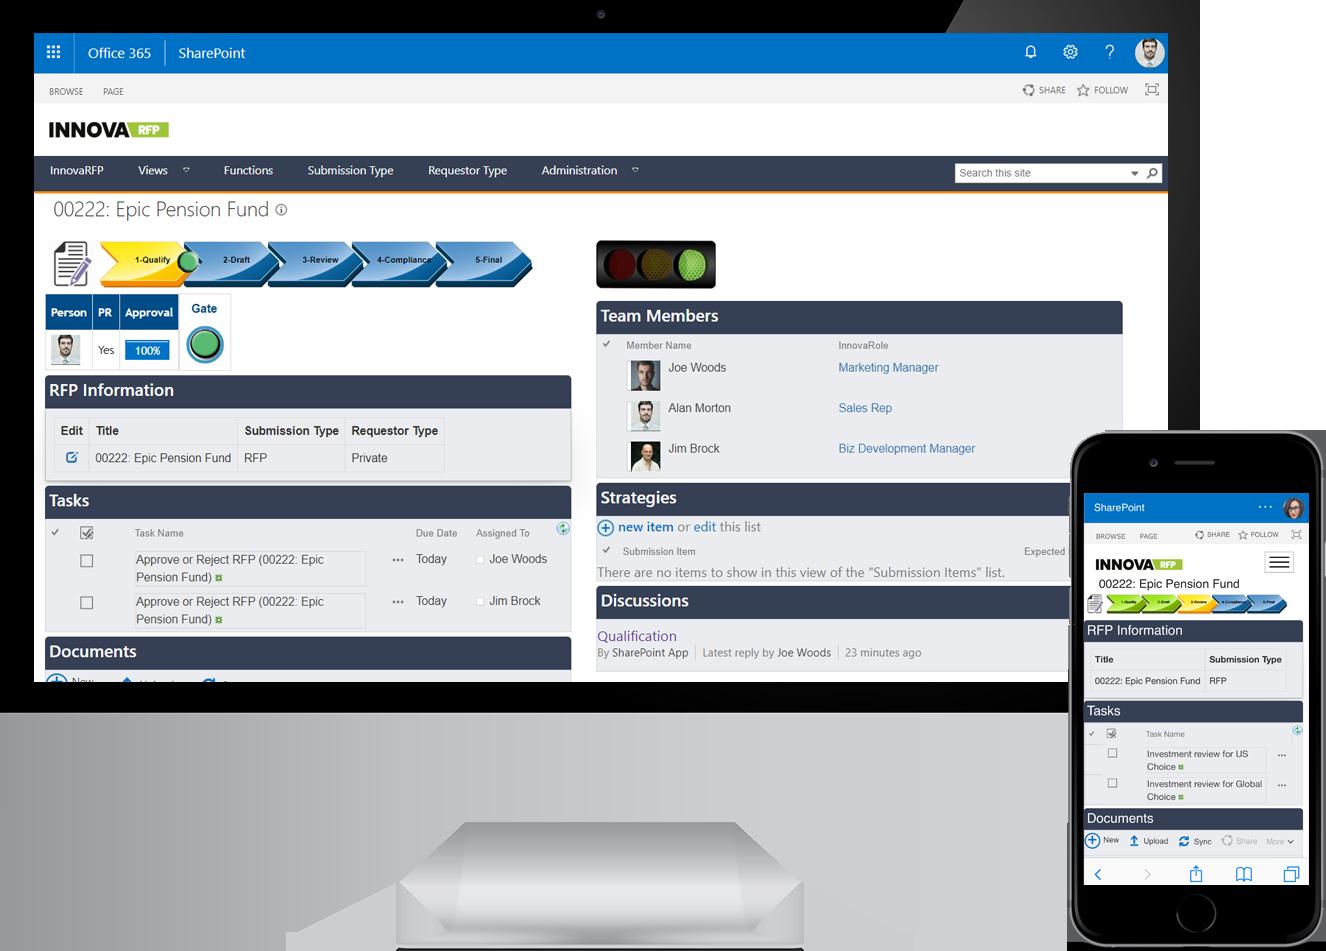 Proposal Management using Microsoft 365